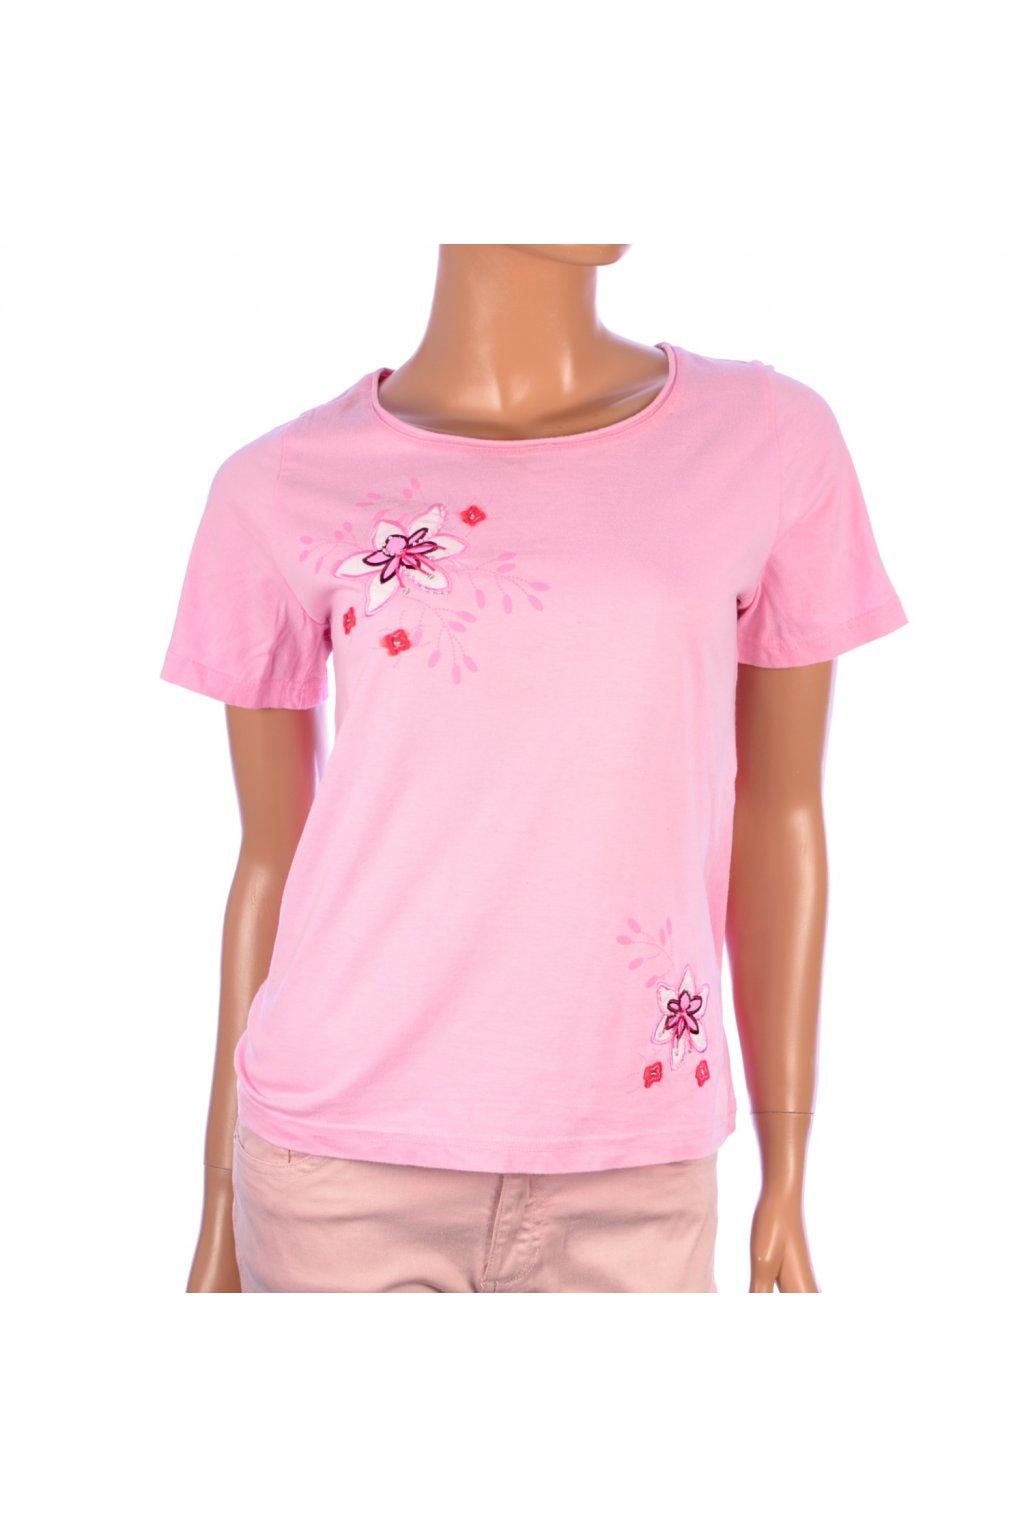 Tričko růžové Lady vel. M / 40